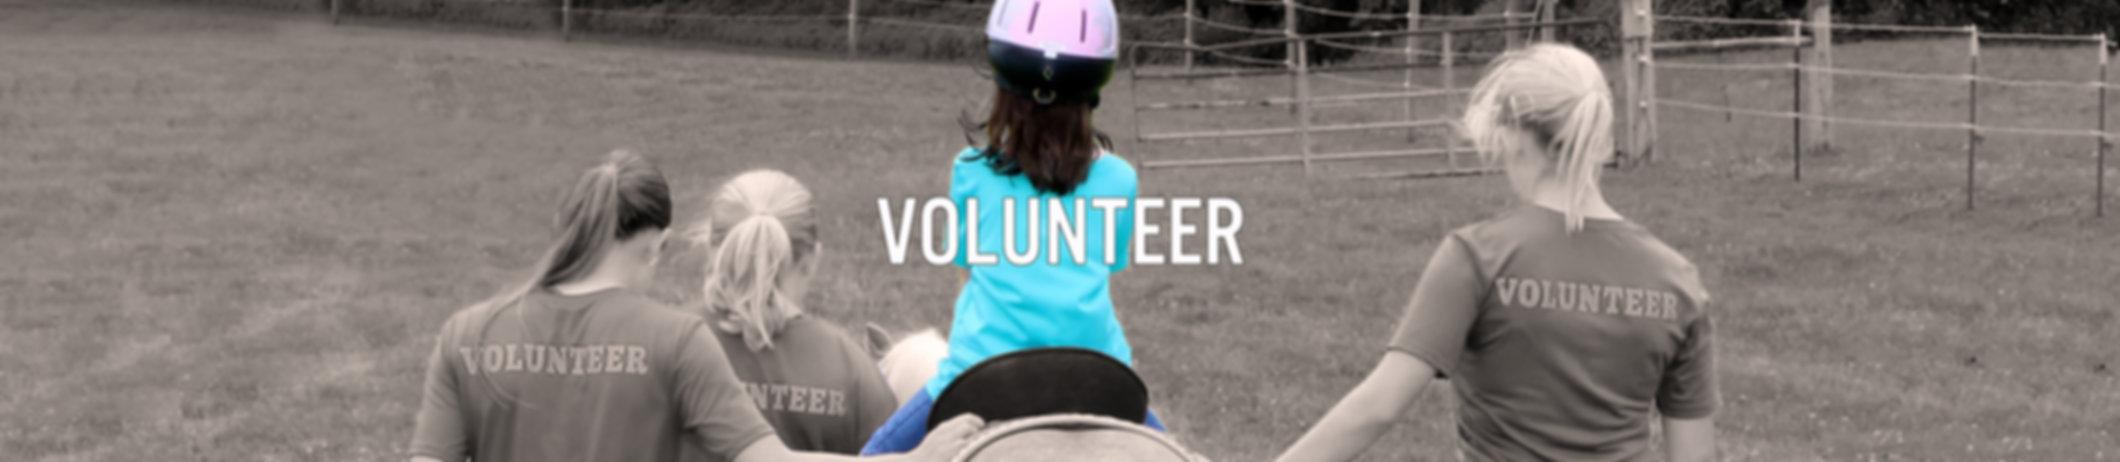 Volunteer2TEXT.jpg